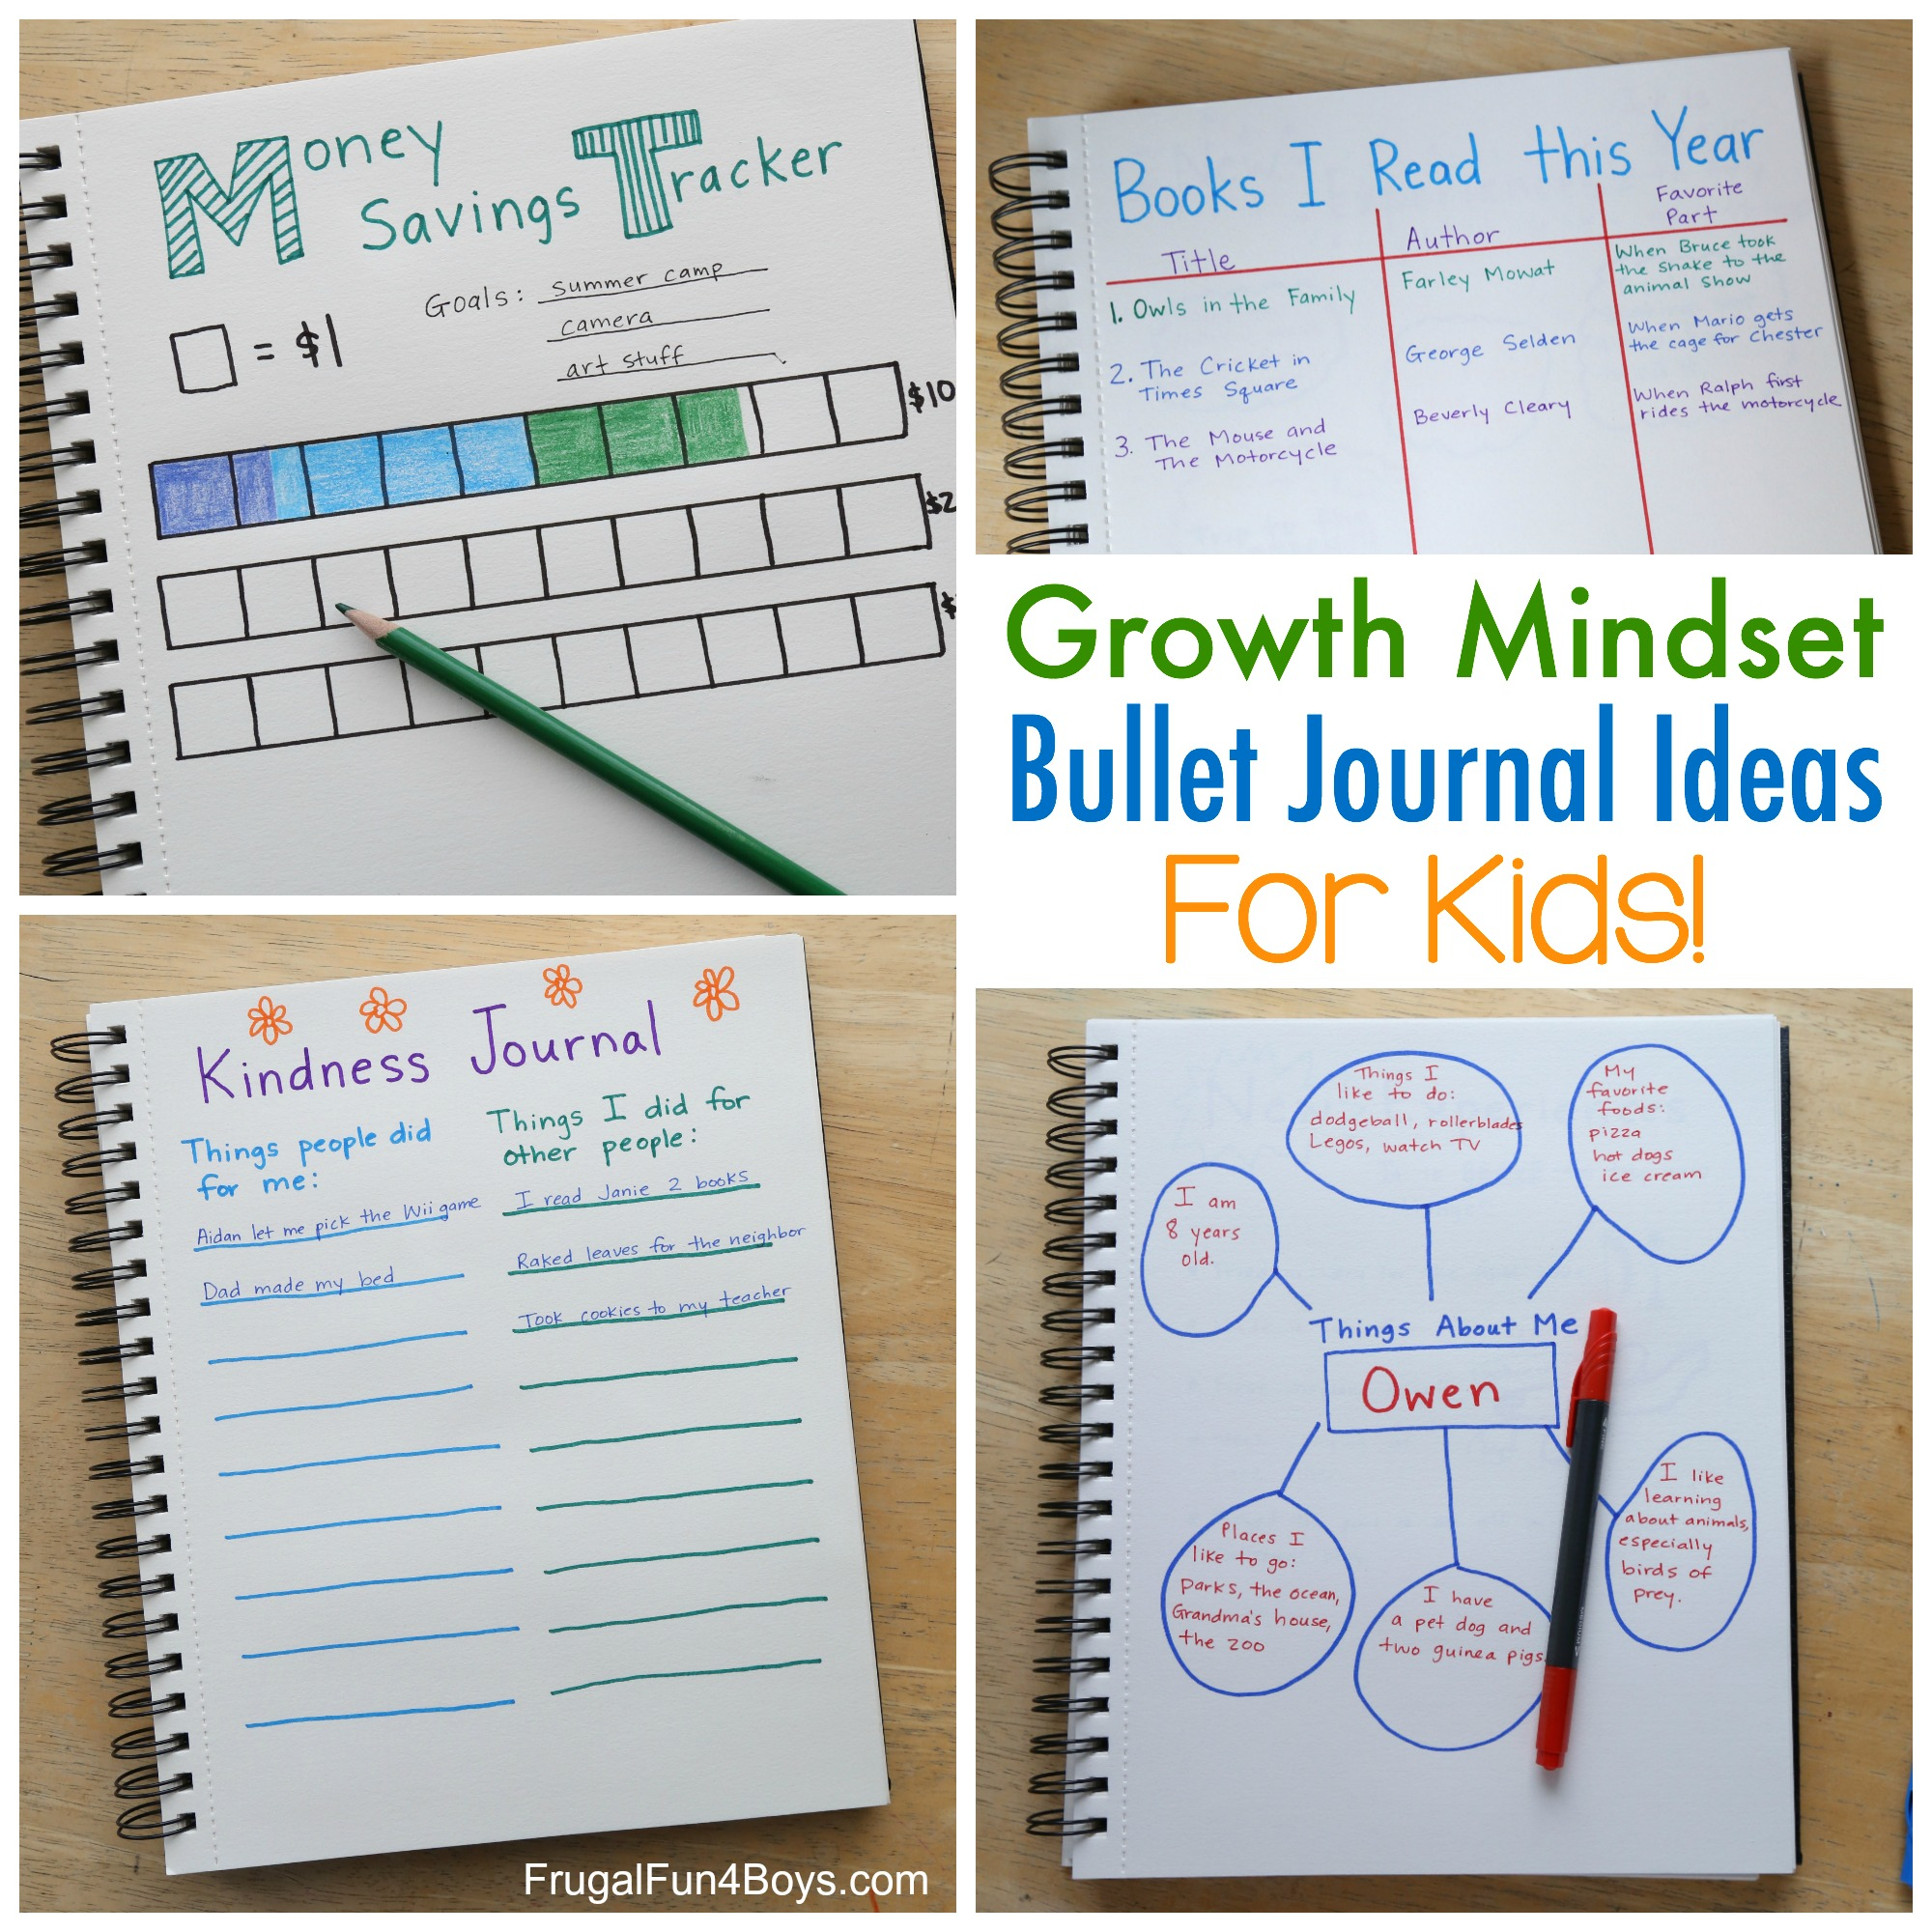 Child's Prayer Journal - Activities for Kids